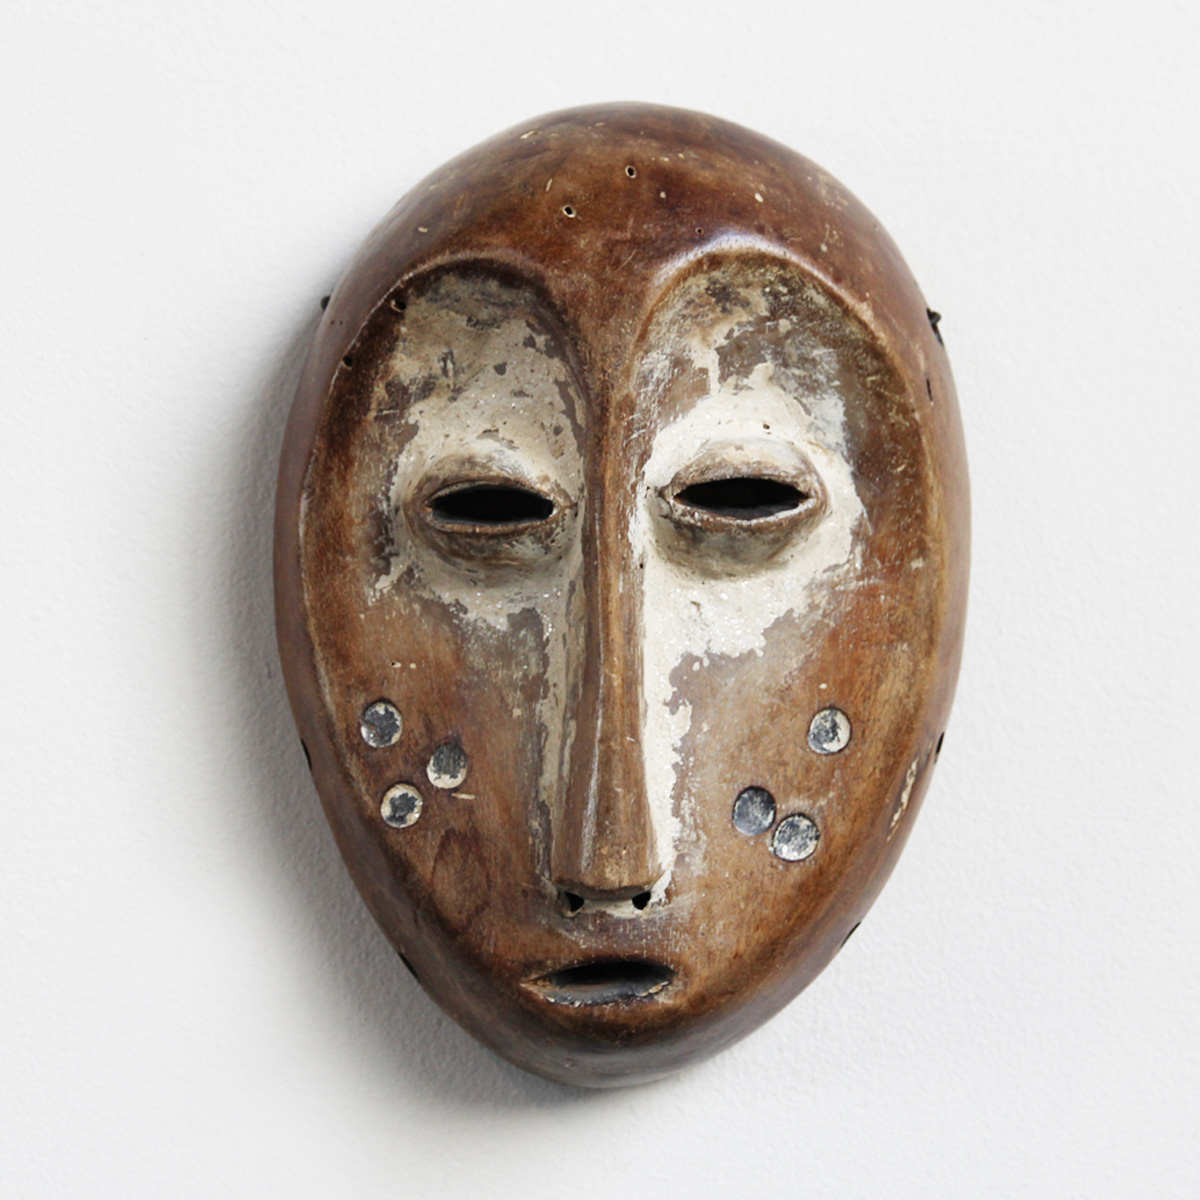 Lega Congo Mask Furniture Design Mix Gallery